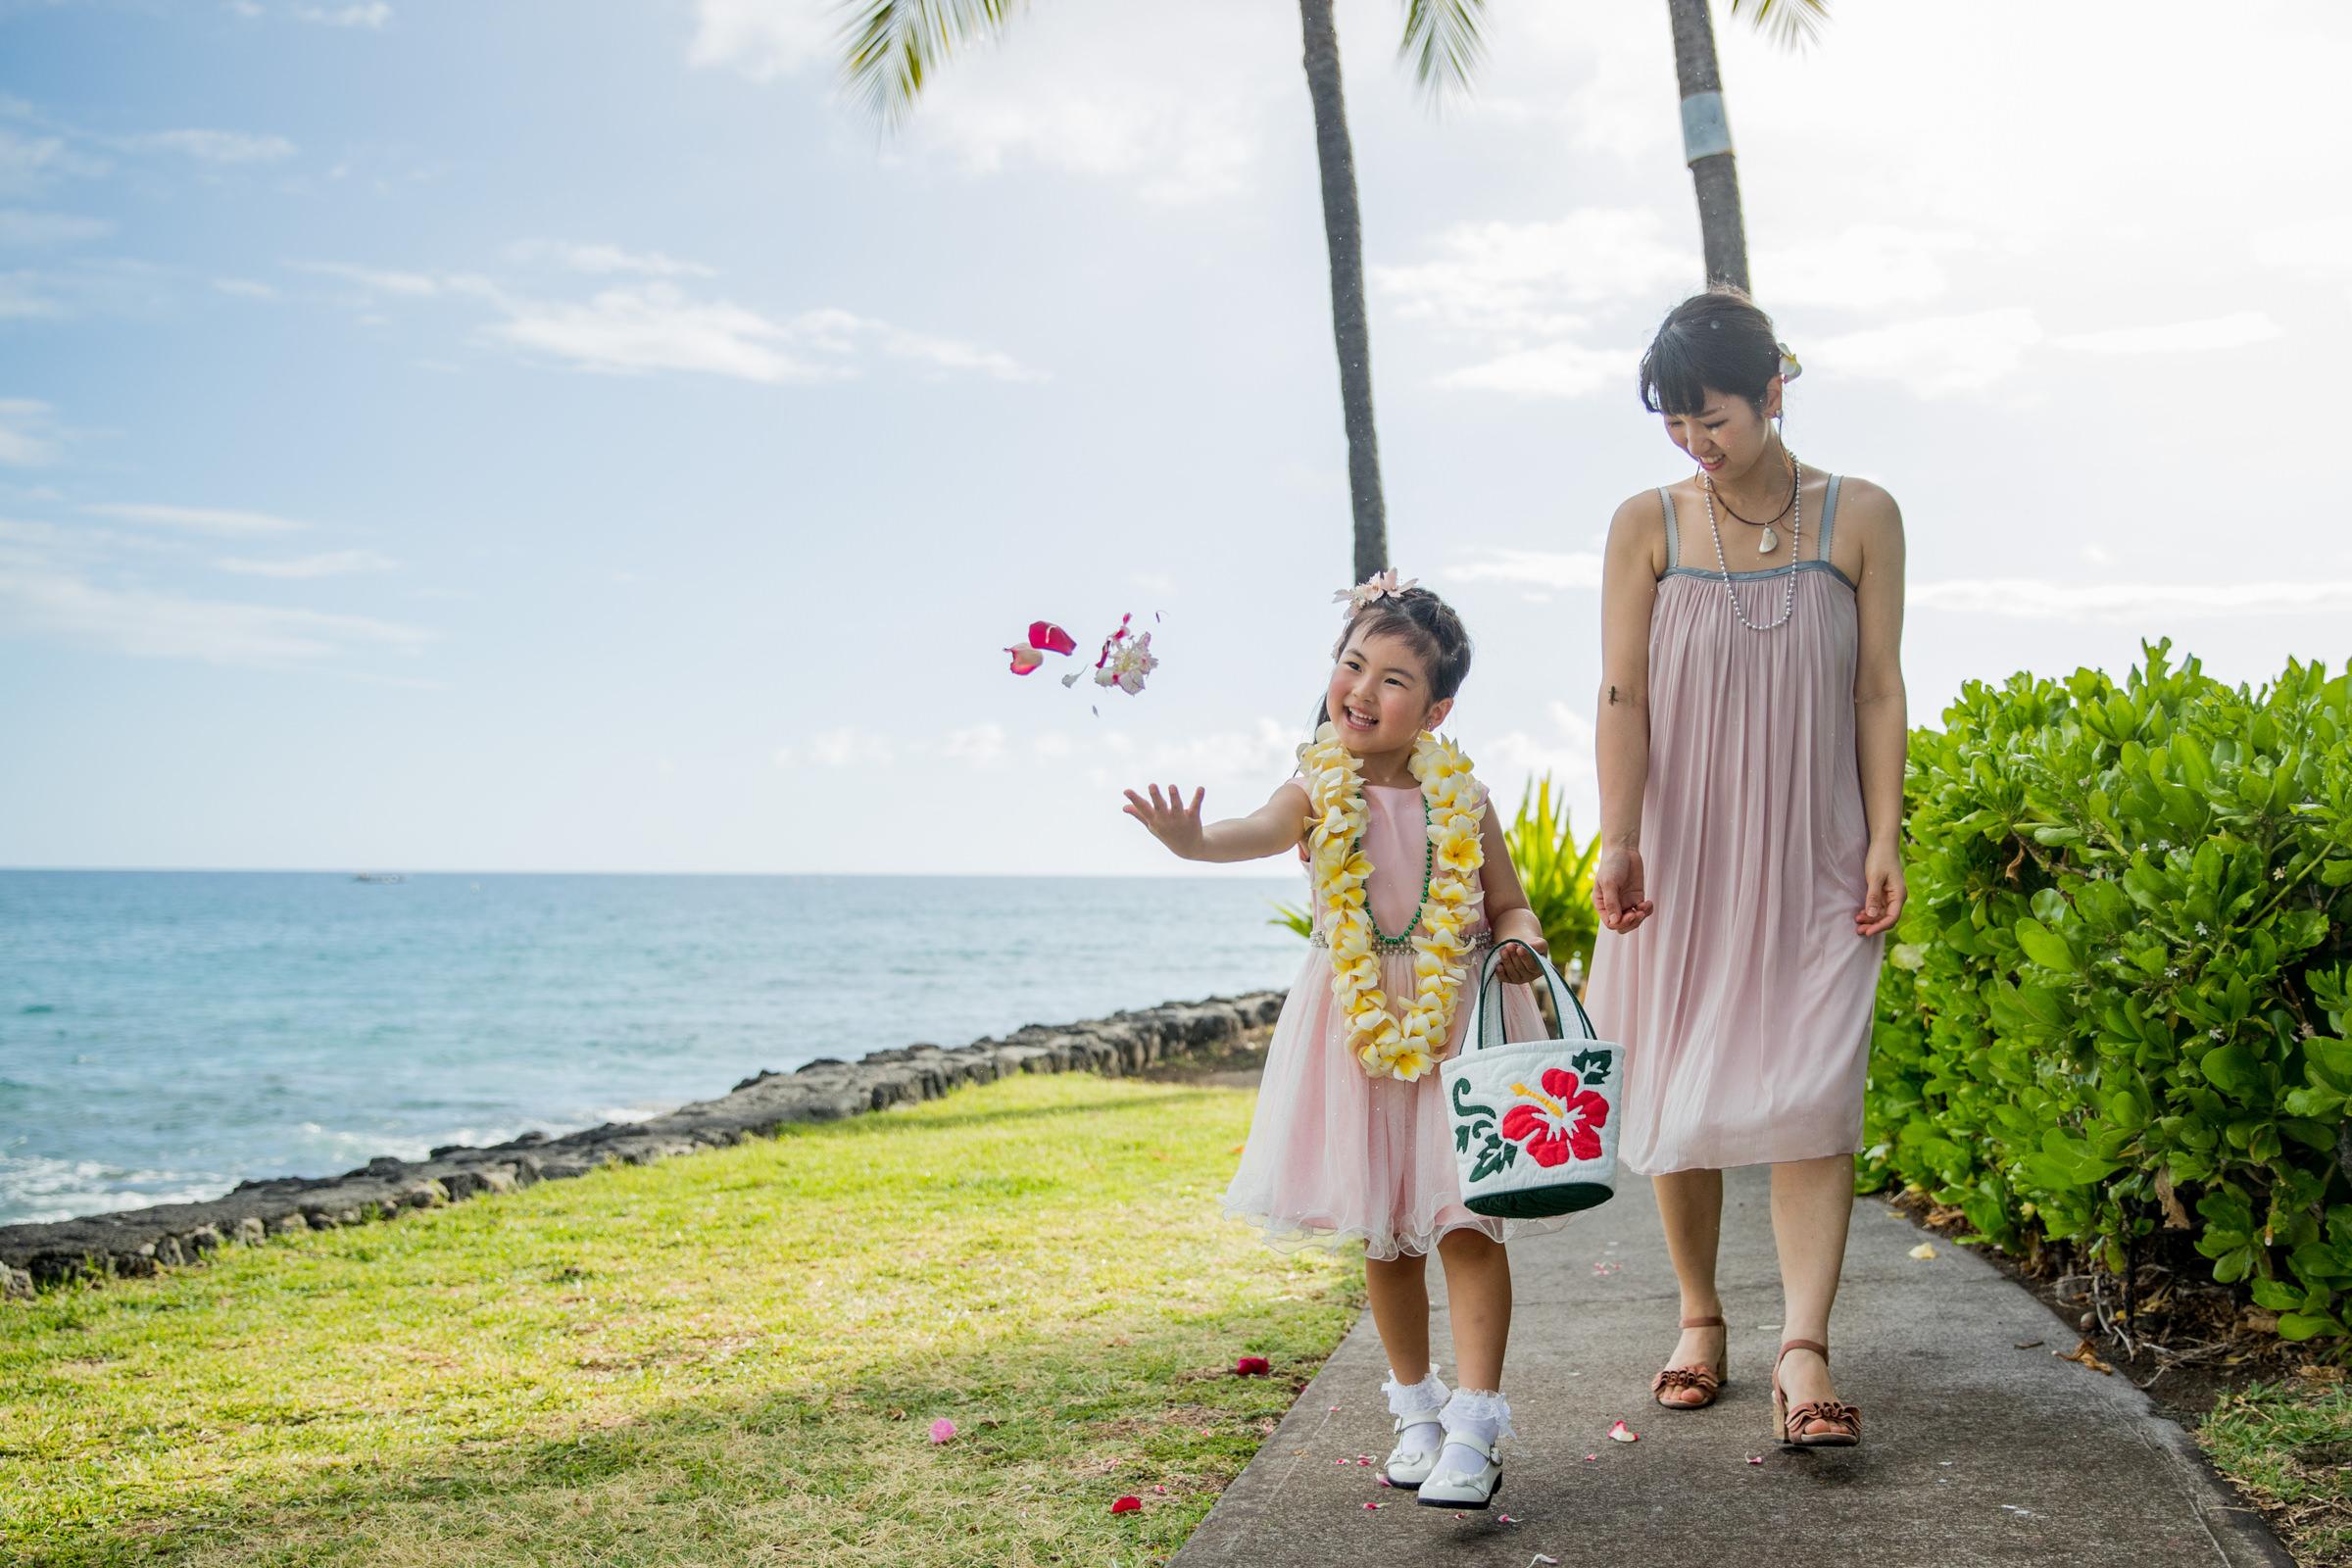 wedding-photographer-photography-destination-hawaii-lake-tahoe-getting-ready-flower-girl